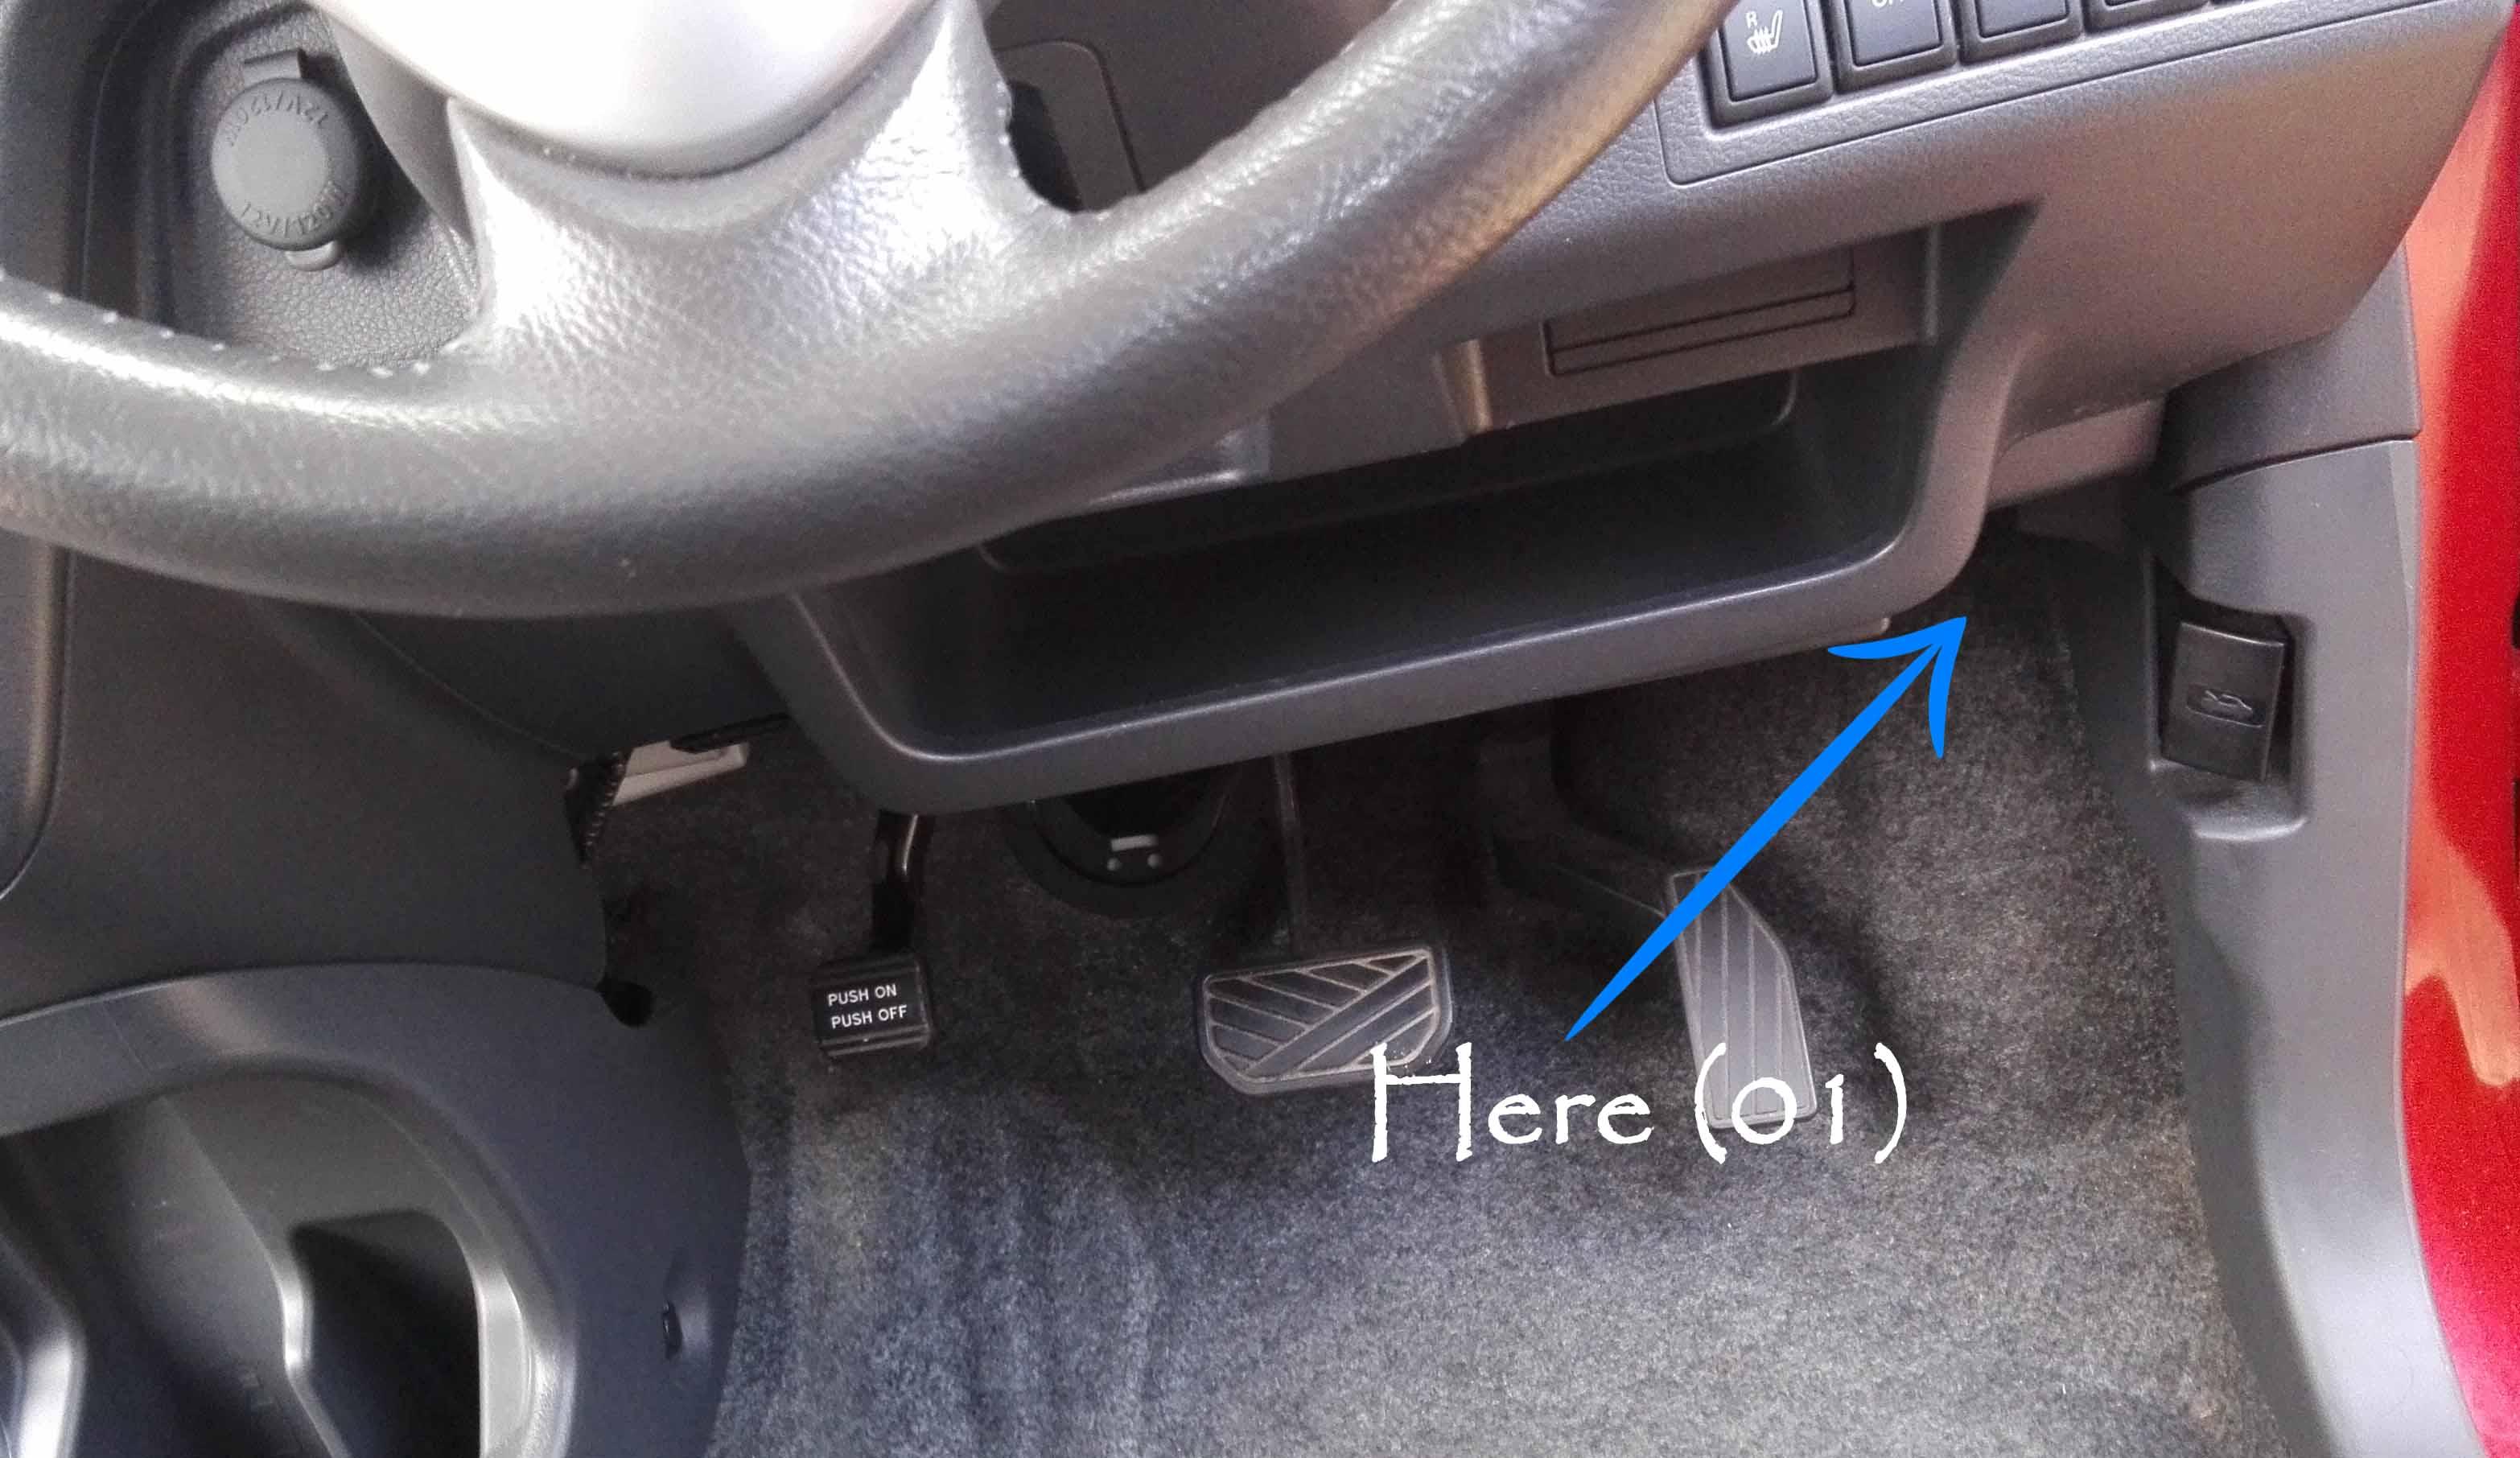 Suzuki WagonR Hybrid (Stingray) – Fuse design - Under the Steering wheel